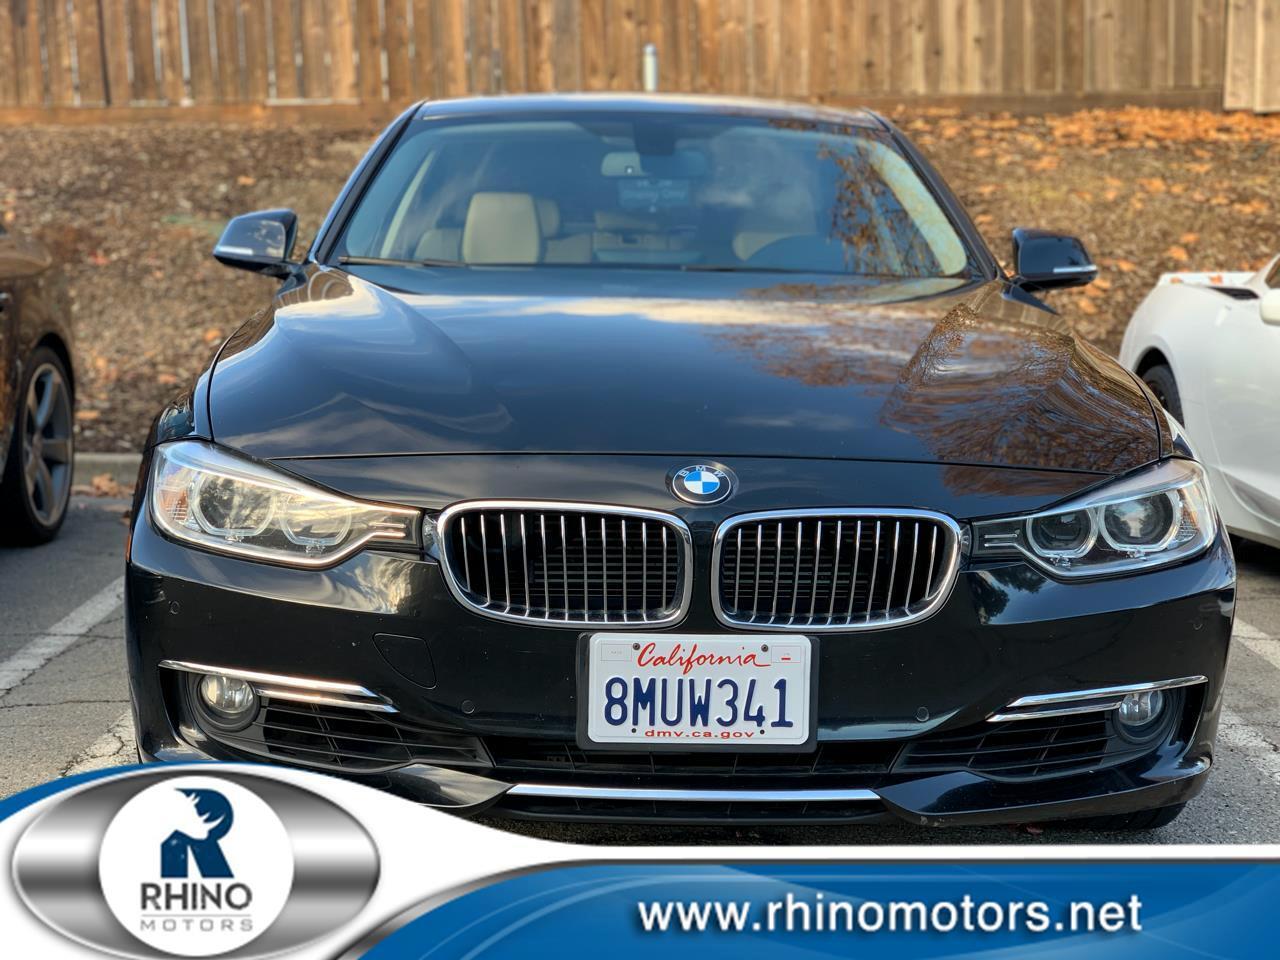 BMW 3 Series 4dr Sdn ActiveHybrid 3 2013